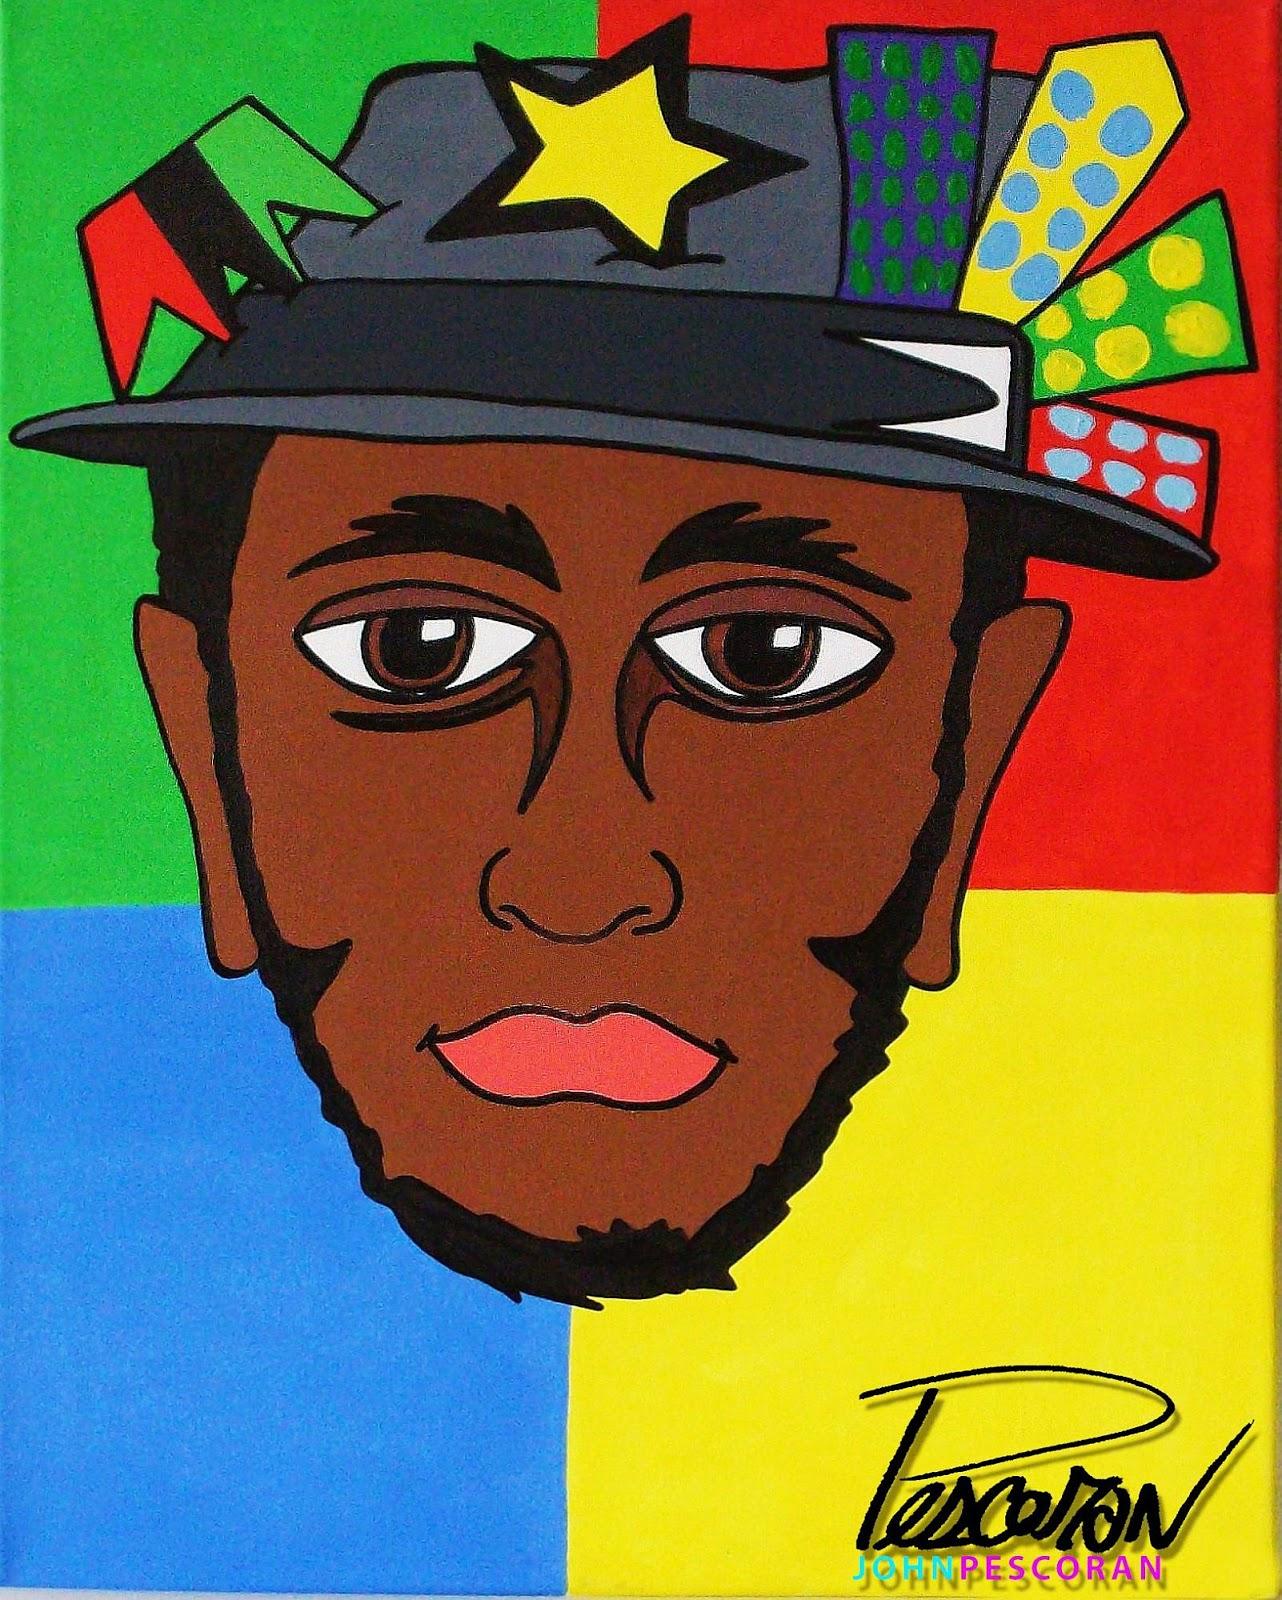 john pescoran surreal pop art portrait paintings series 1 musicians. Black Bedroom Furniture Sets. Home Design Ideas